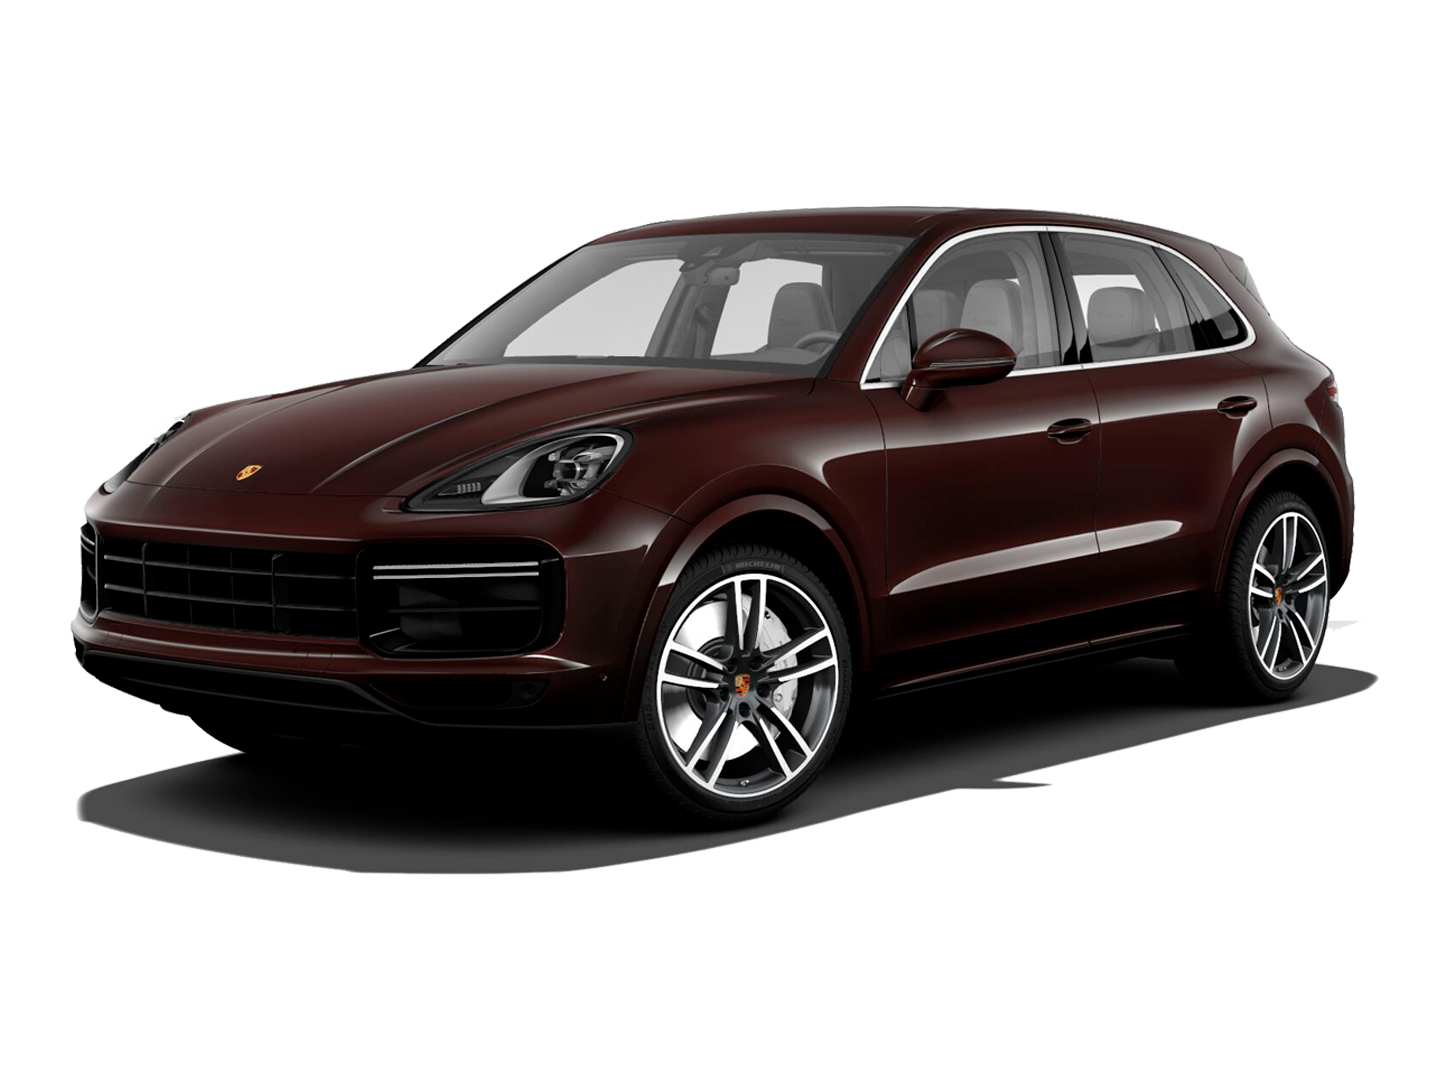 PORSCHE - CAYENNE - 4.0 V8 GASOLINA TURBO AWD TIPTRONIC S